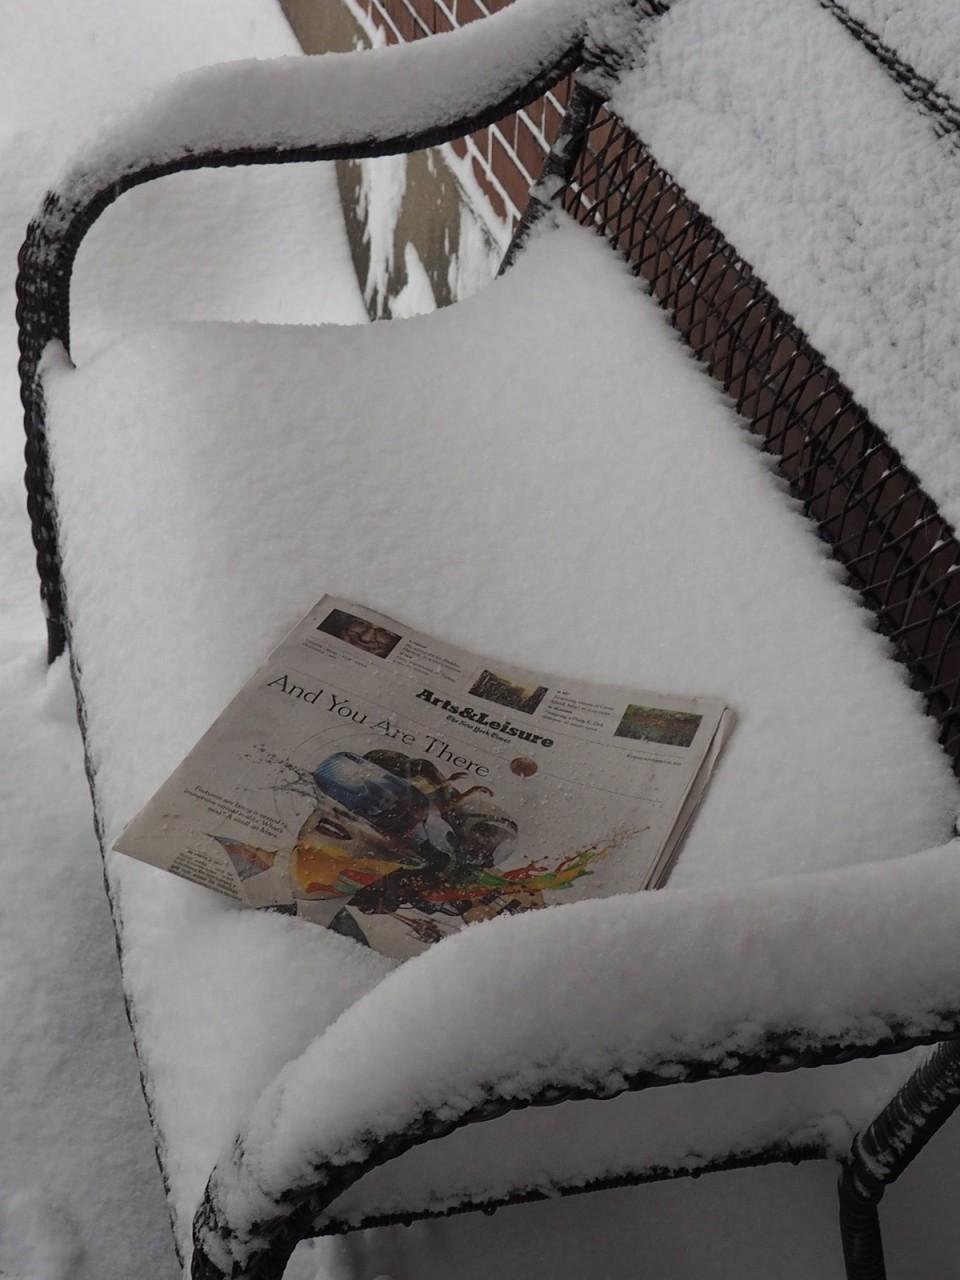 Ottawa Winter, December 29, 2015